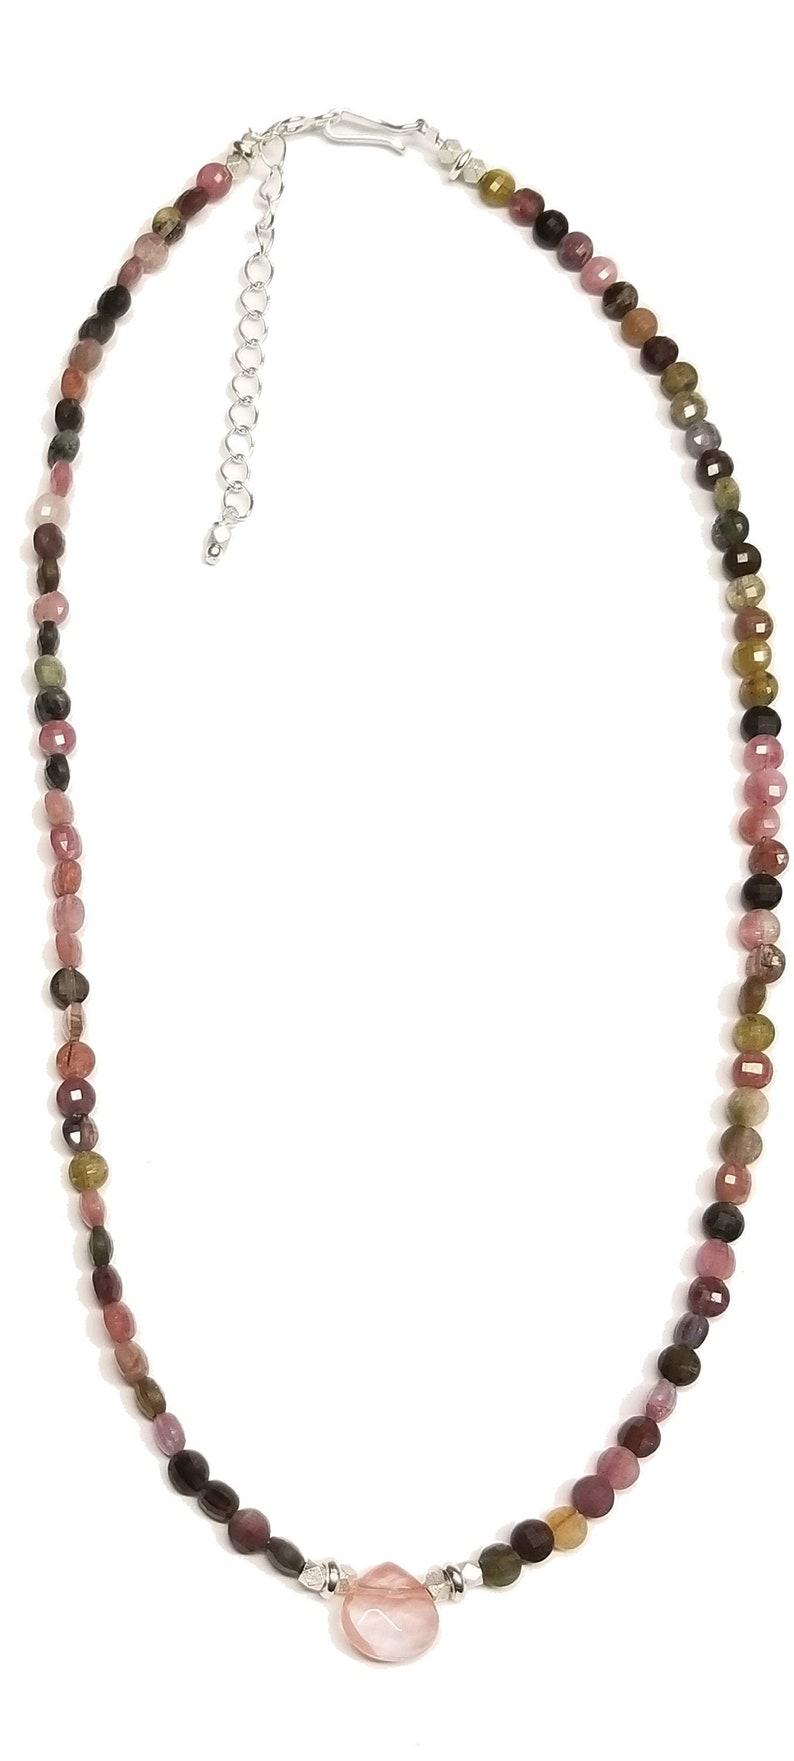 Tourmaline 18 Silver Necklace with Cherry Quartz Briolette